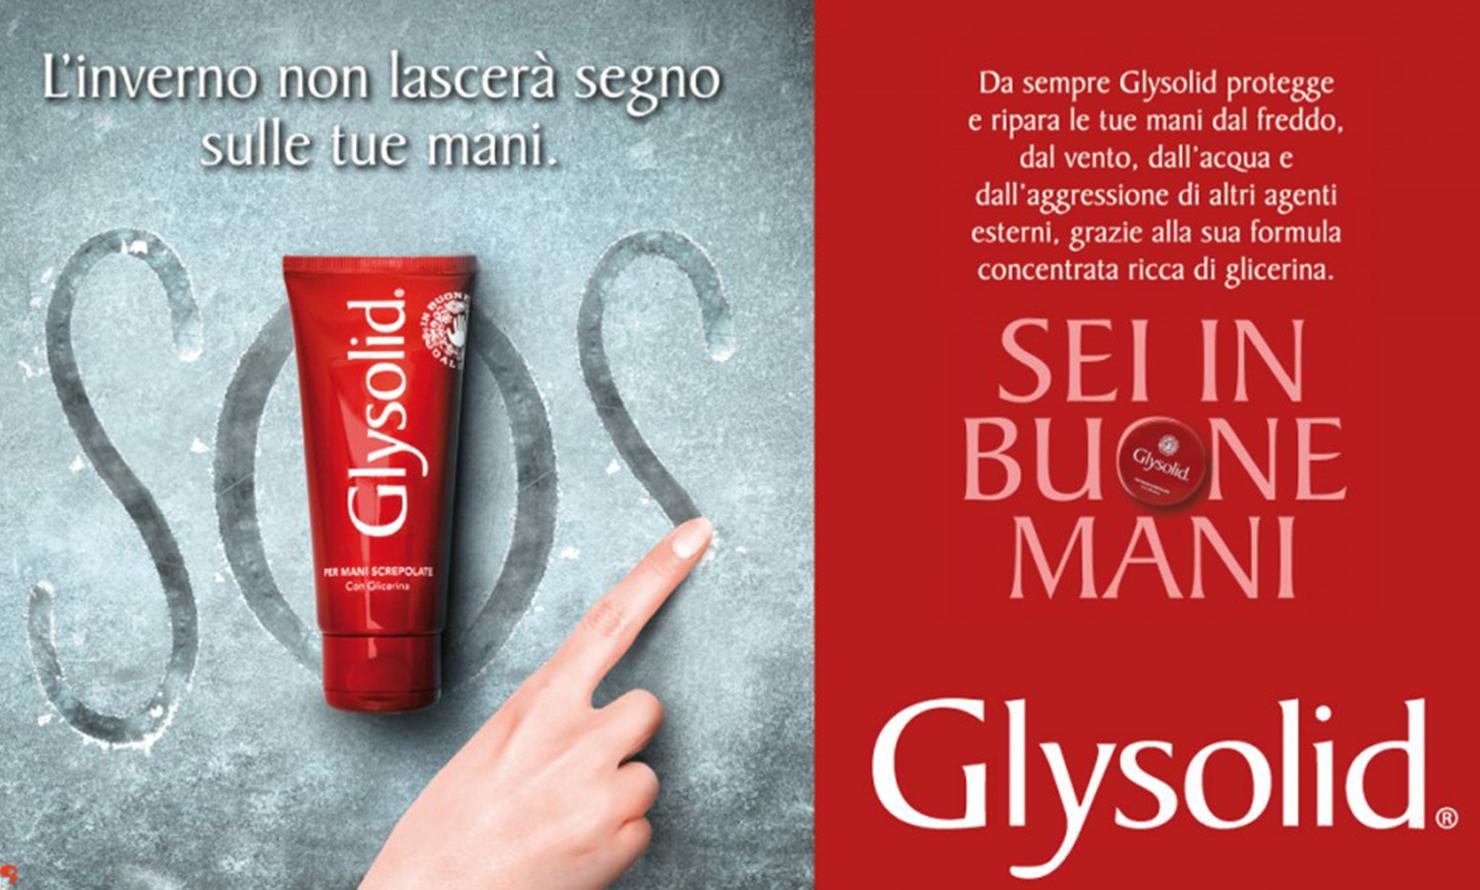 https://kubelibre.com/uploads/Slider-work-tutti-clienti/unilever-glysolid-sei-in-buone-mani-1.jpg